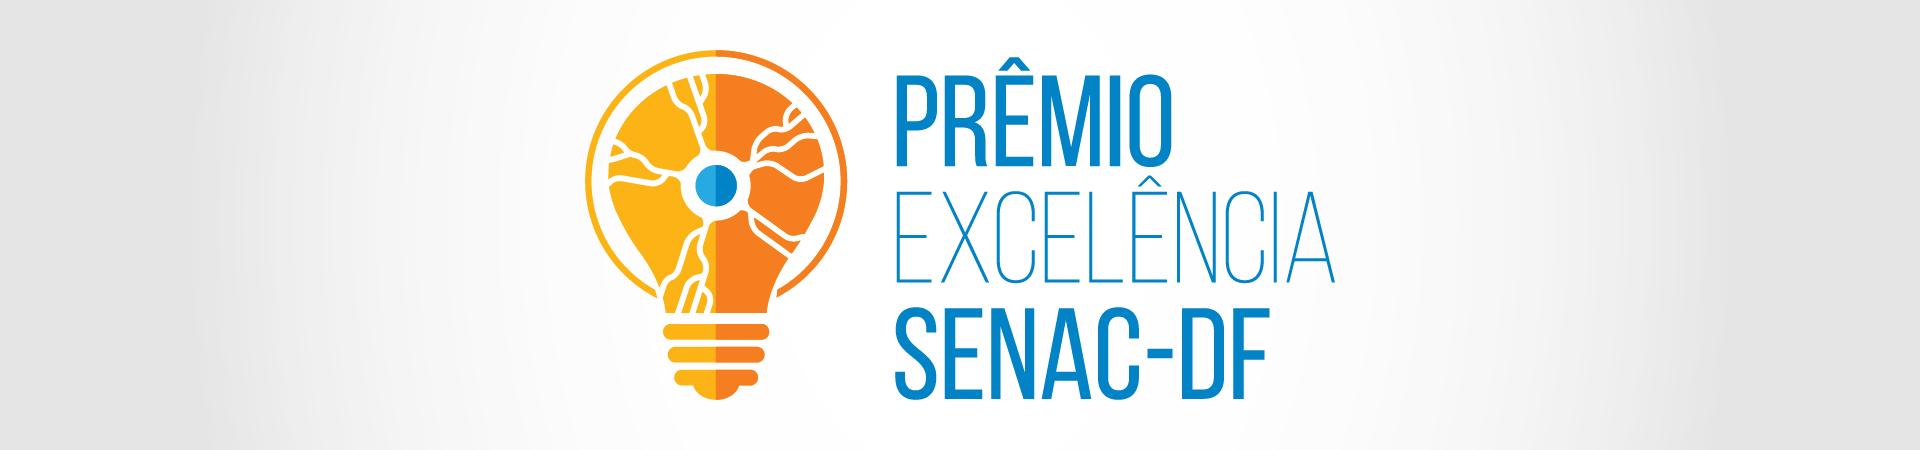 Prêmio Excelência Senac -DF